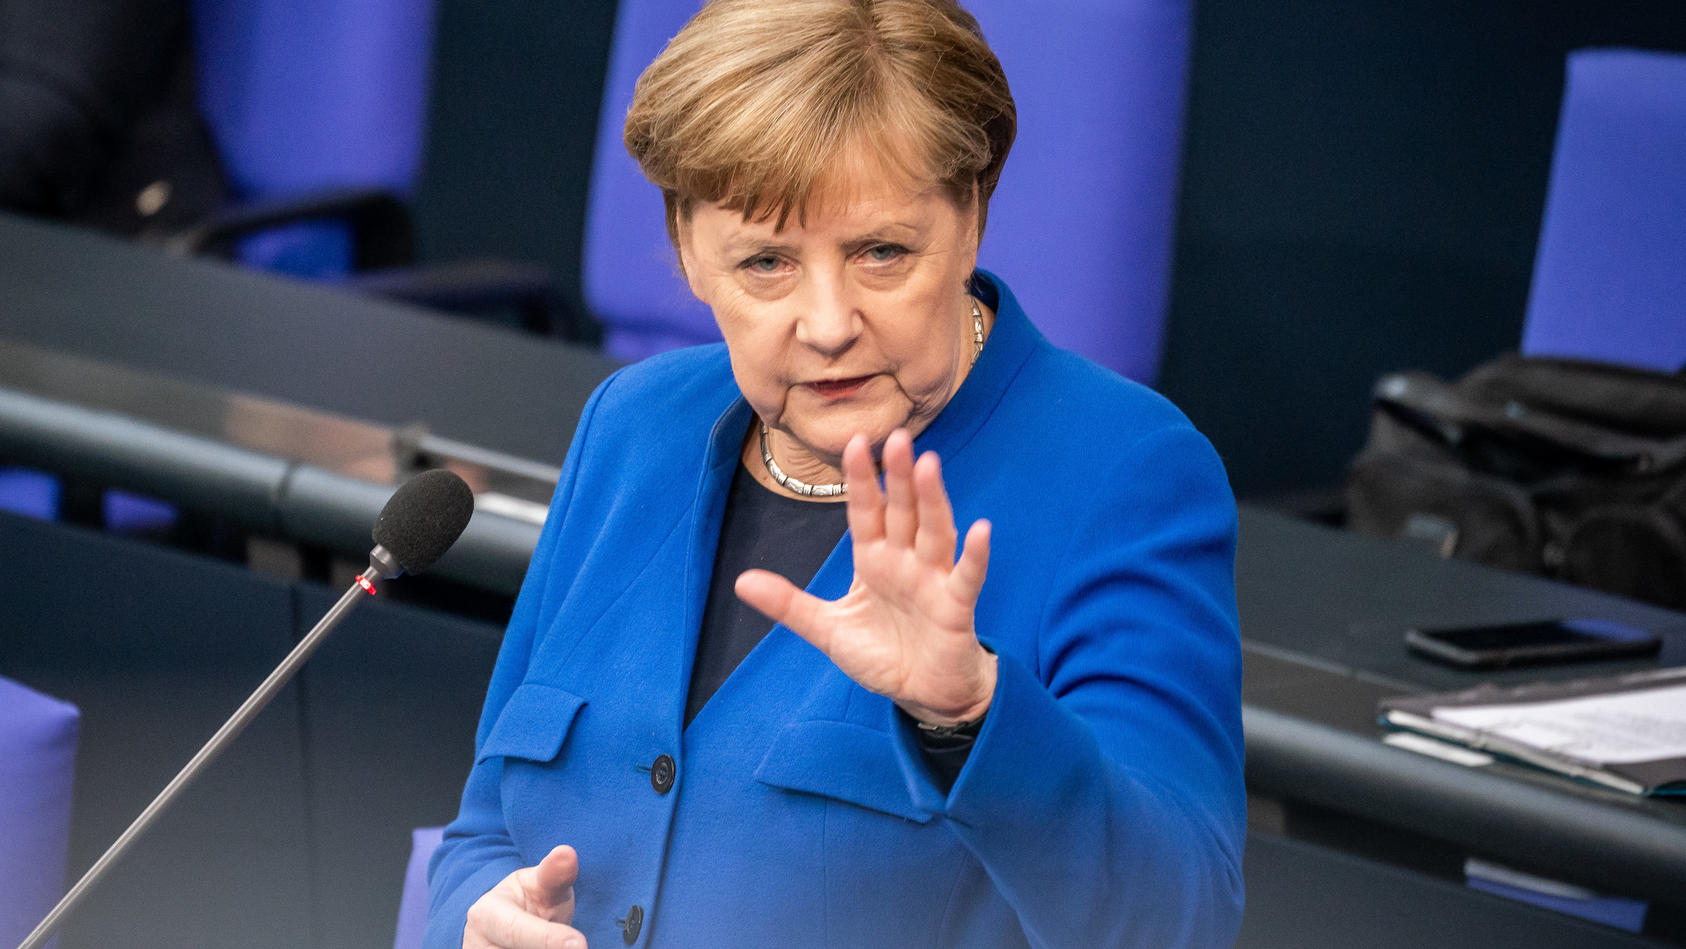 Merkel Pressekonferenz Livestream